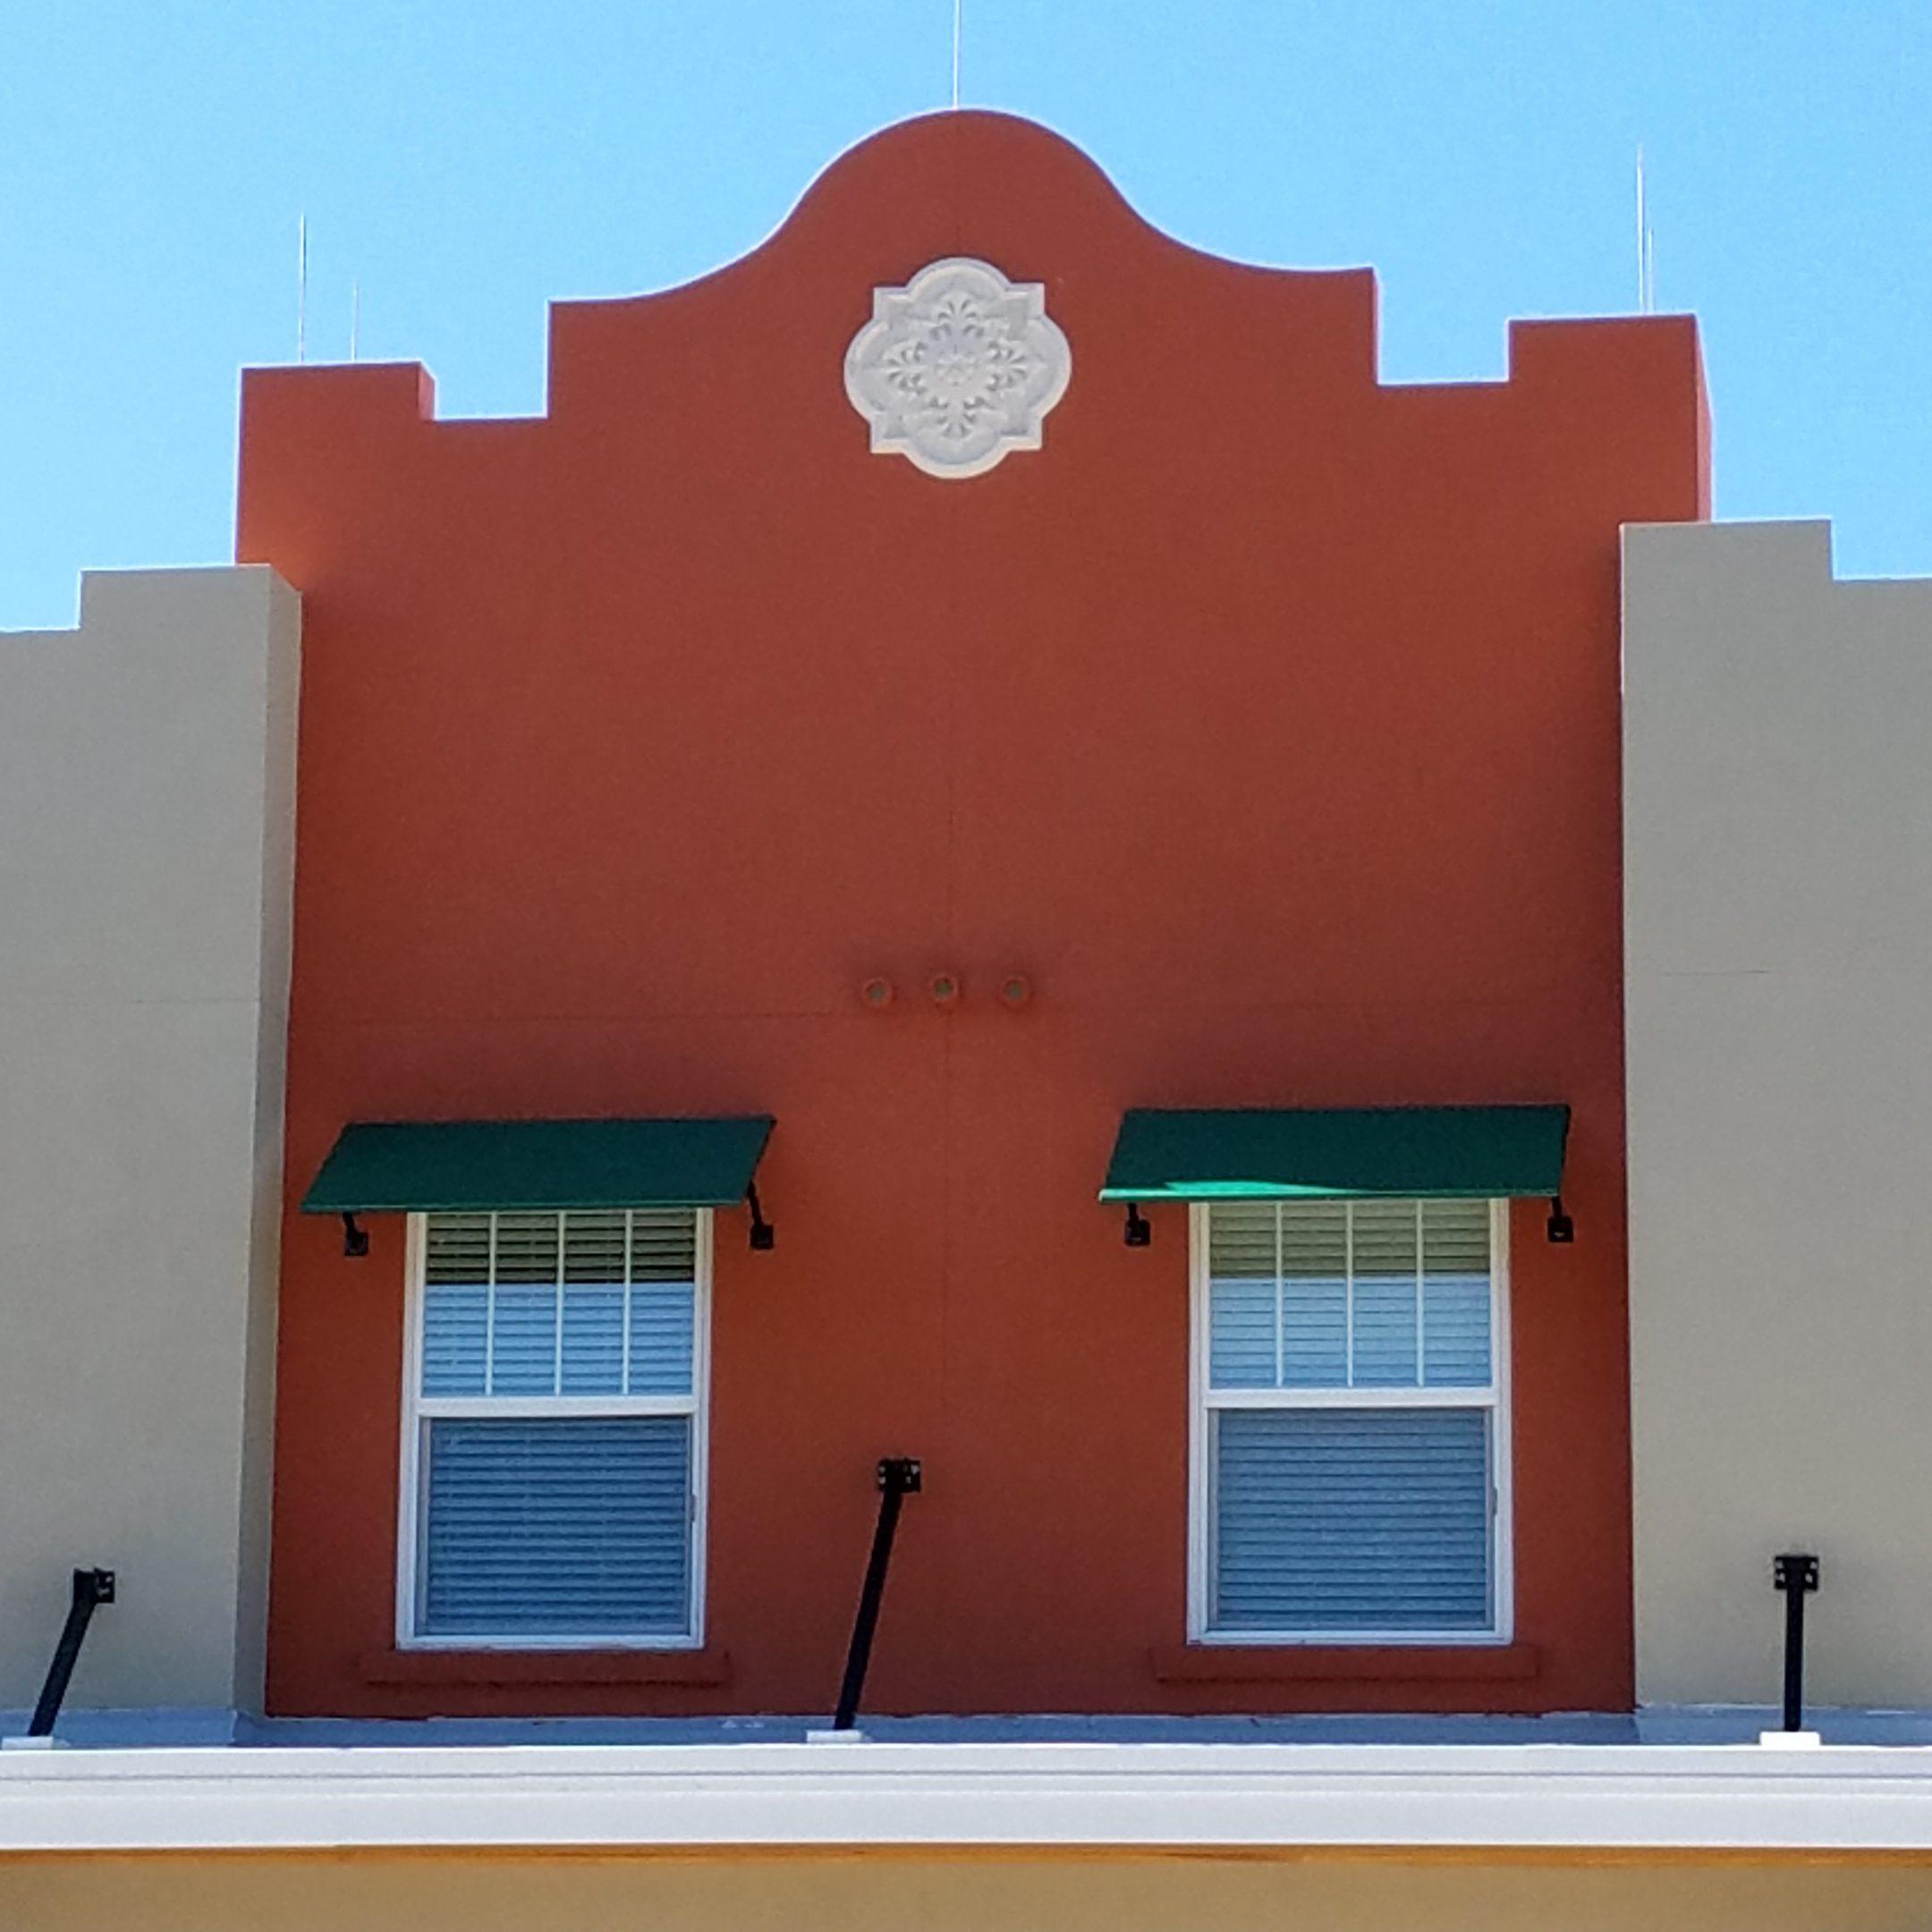 florida-housing-3-e1514911606901.jpg